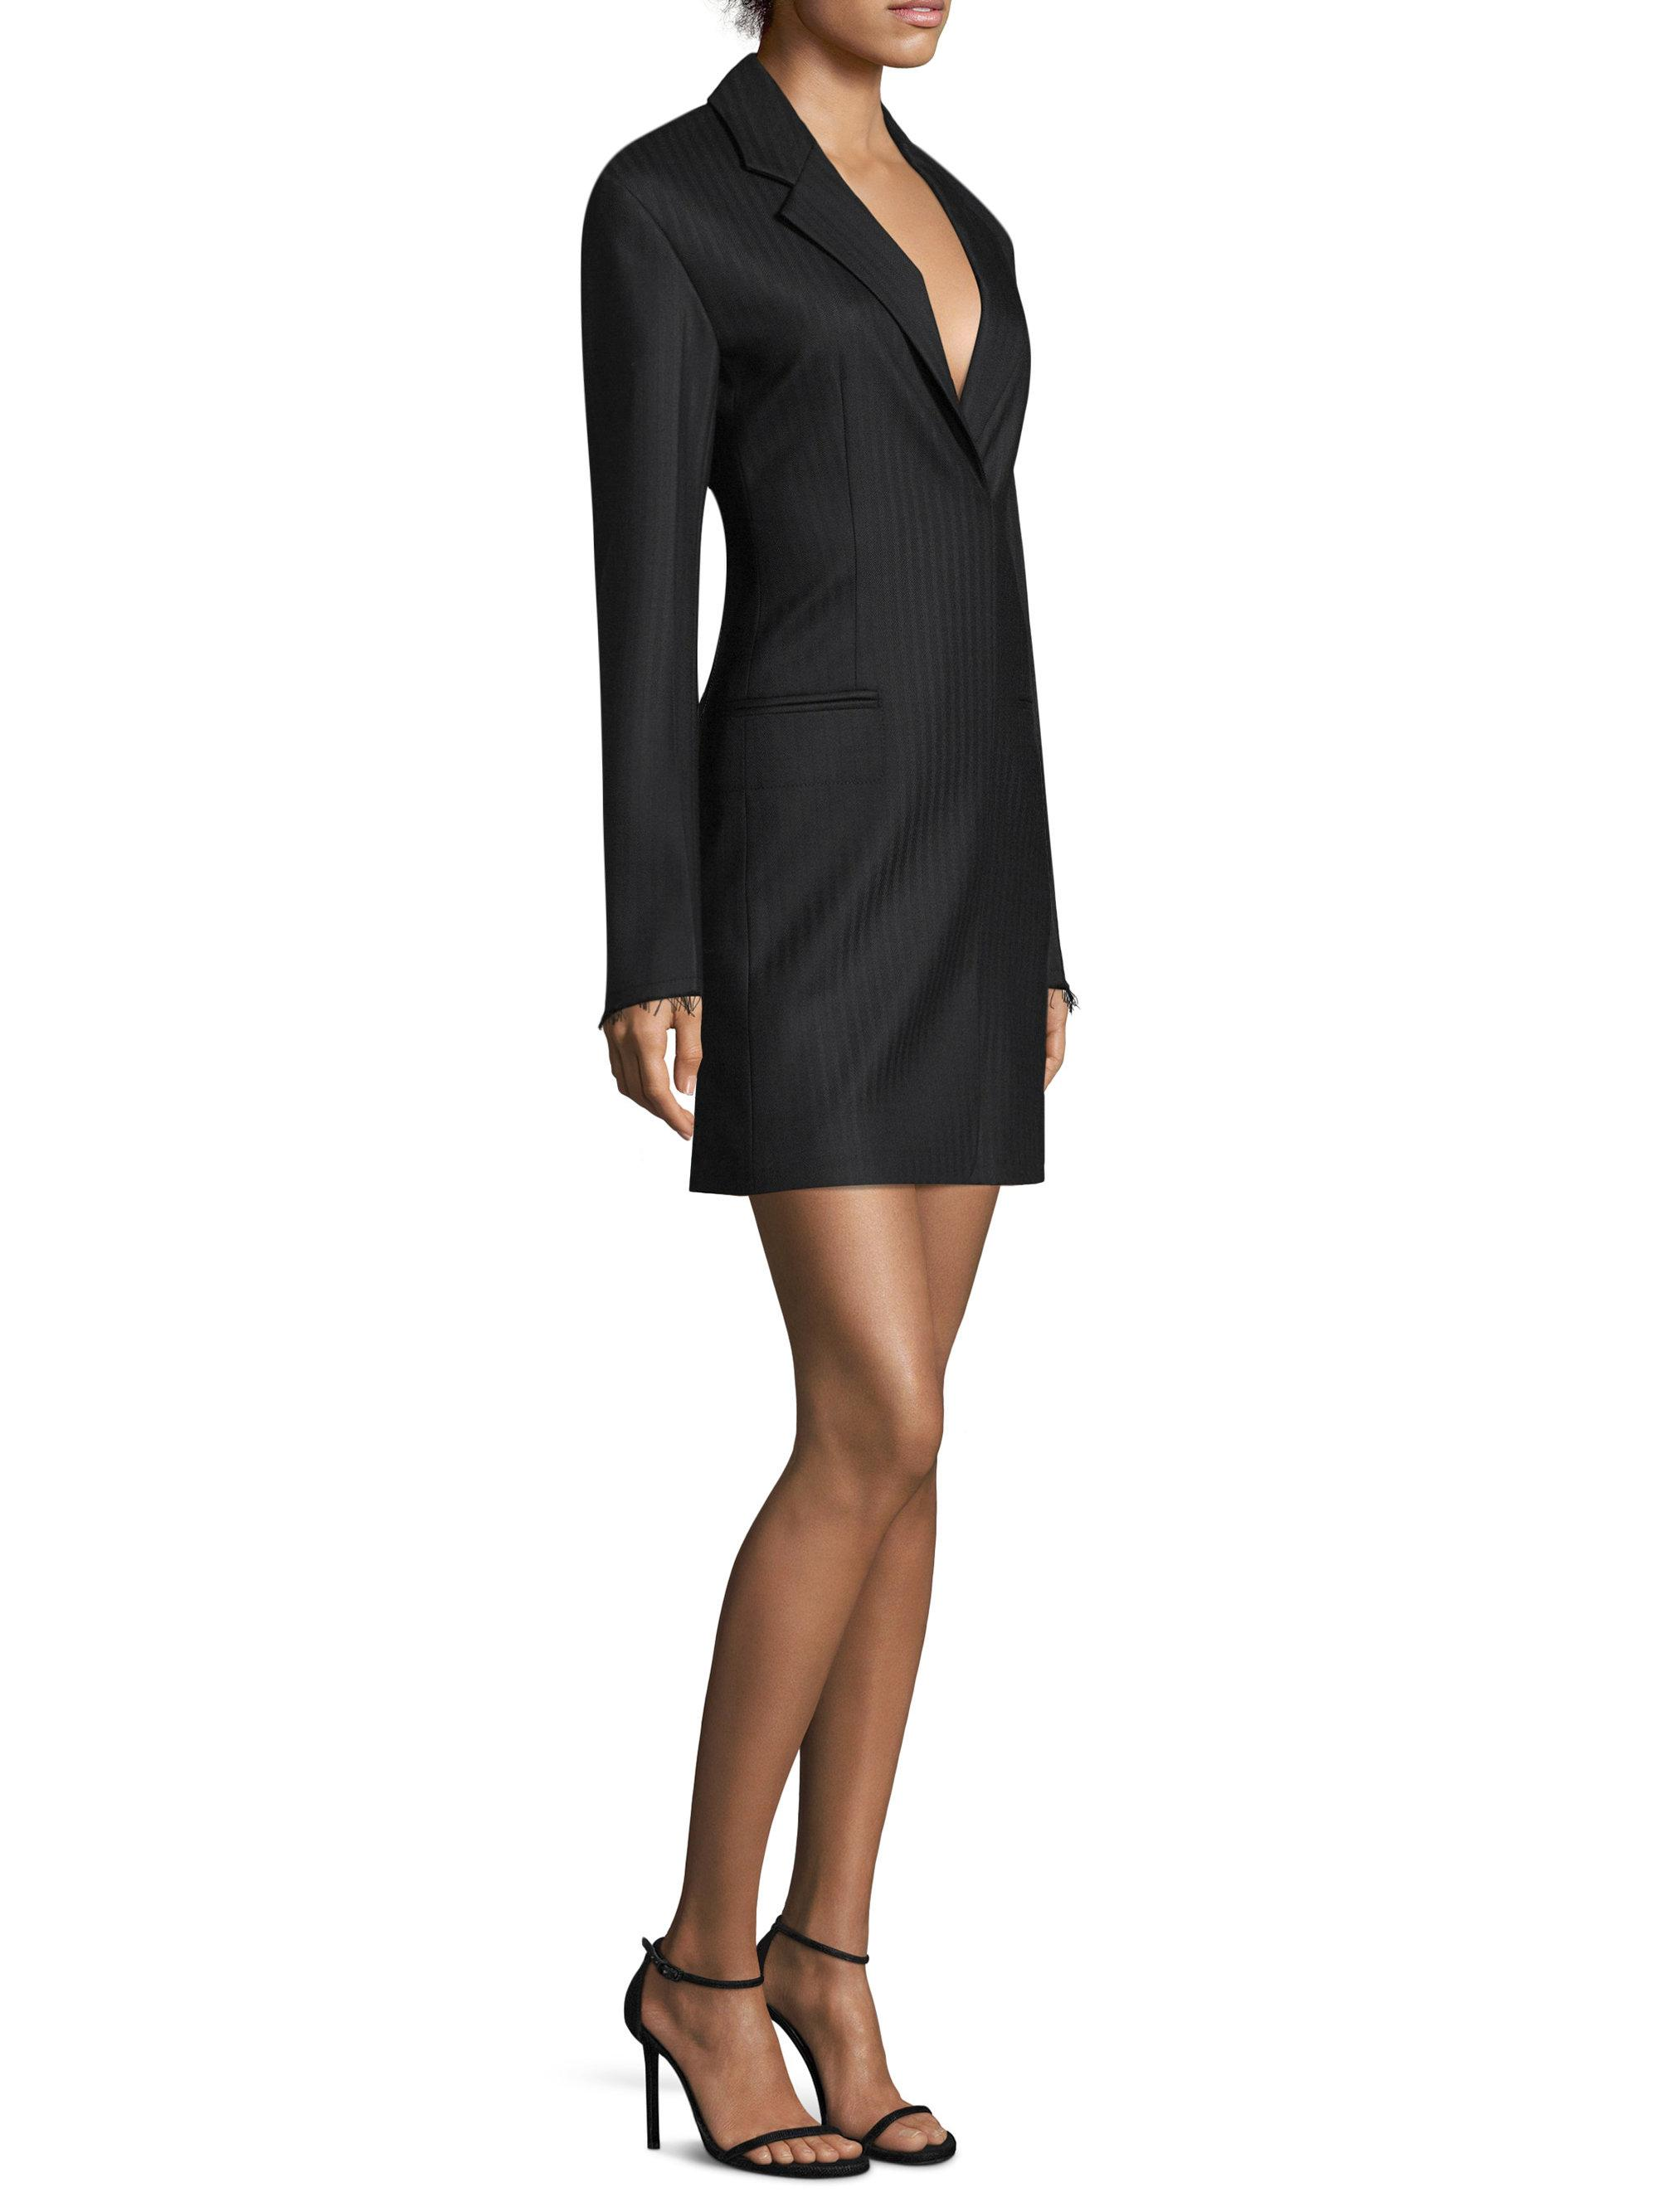 5c9a62d920be Helmut Lang Herringbone Wool Blazer Dress in Black - Lyst